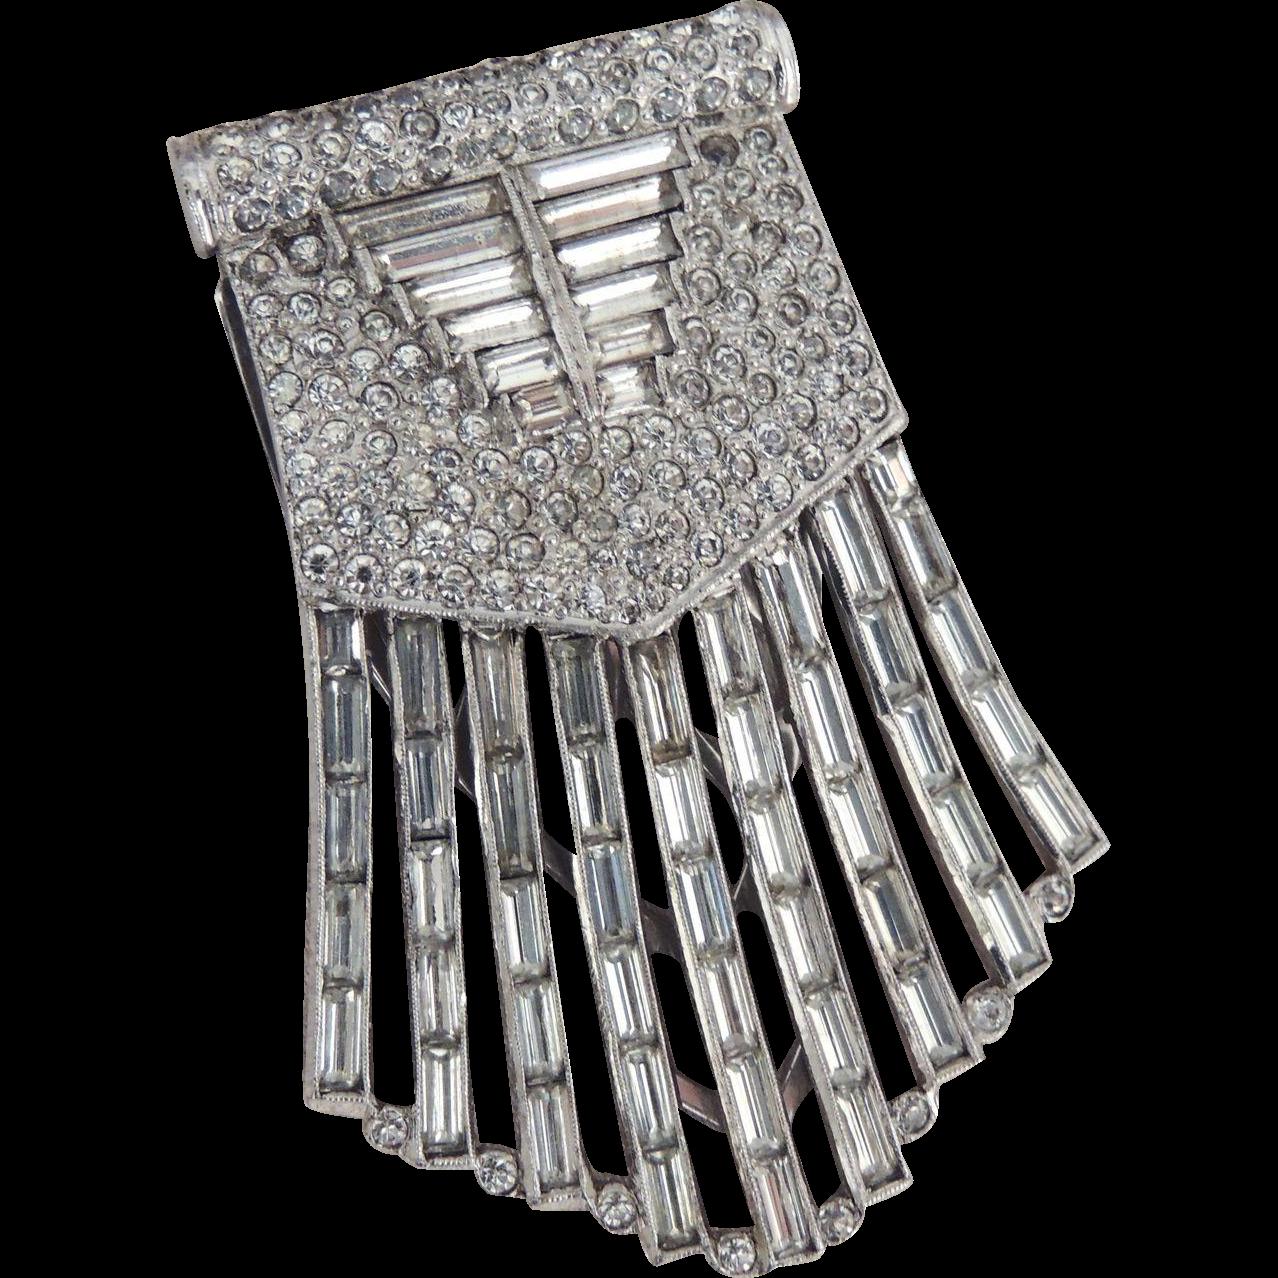 Rhinestone Dress Clip Art Deco Statement Size Unsigned c1930's